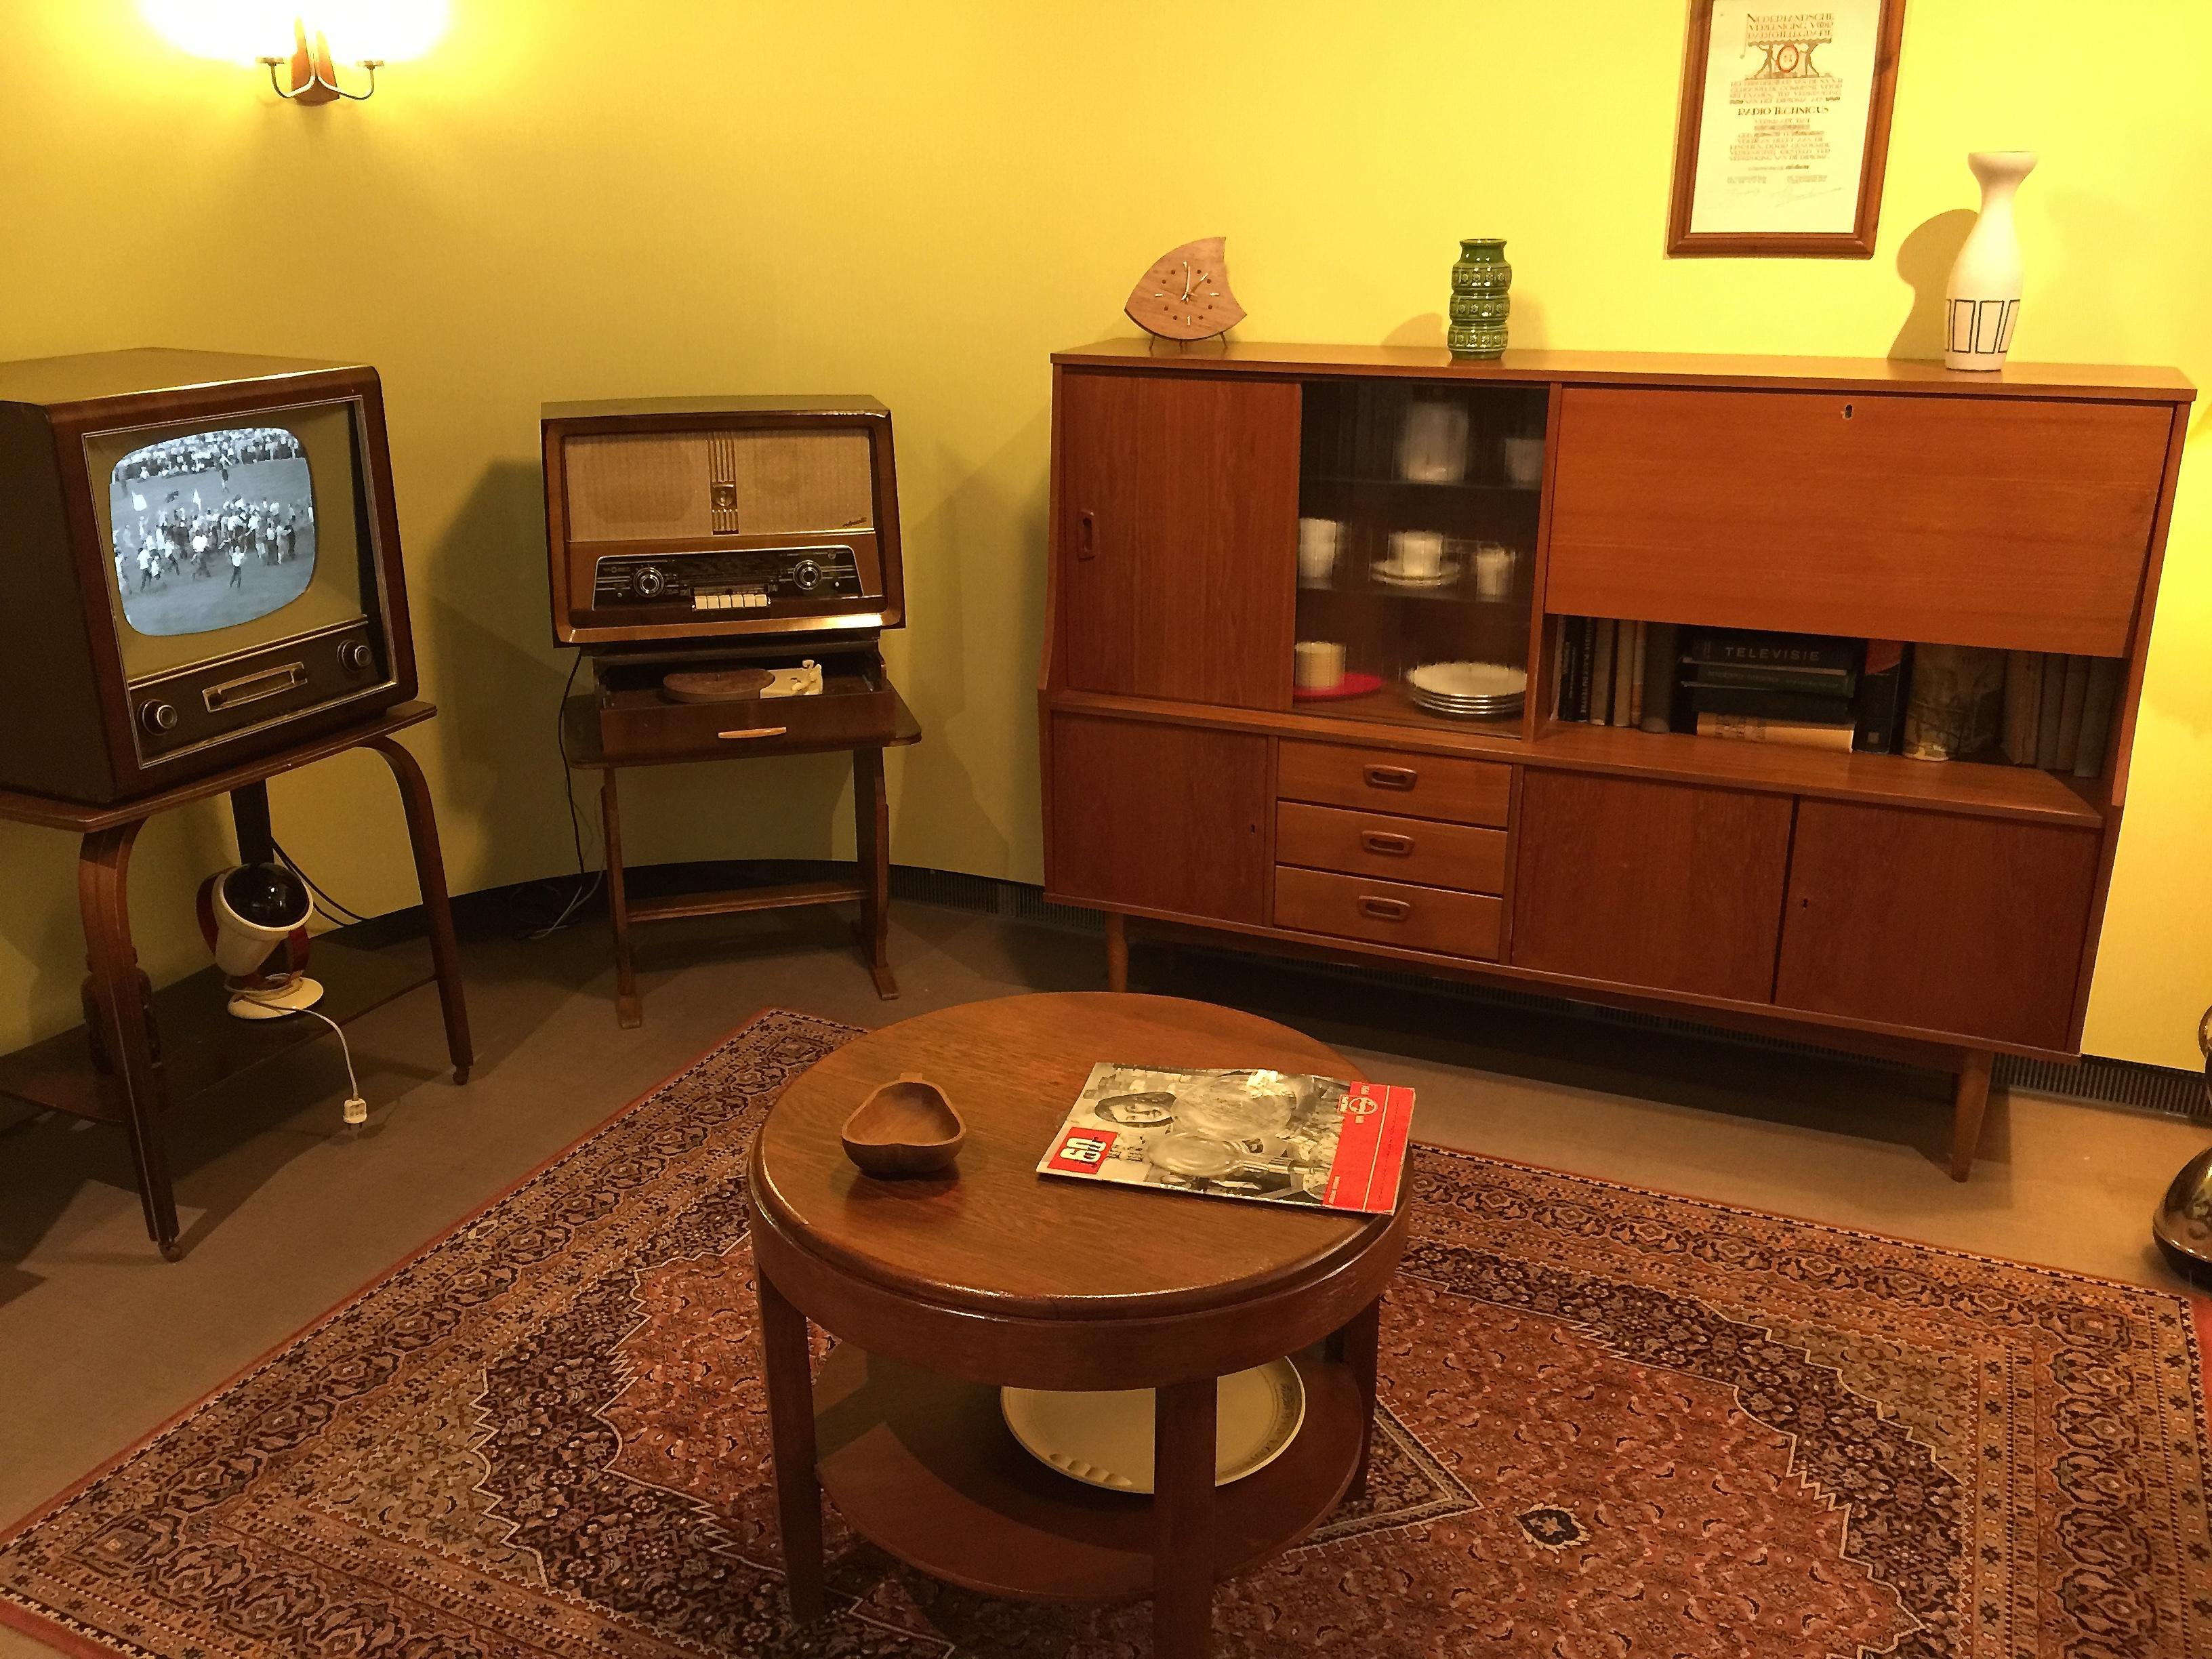 File:\'Huiskamer jaren 50\' (16183341671).jpg - Wikimedia Commons